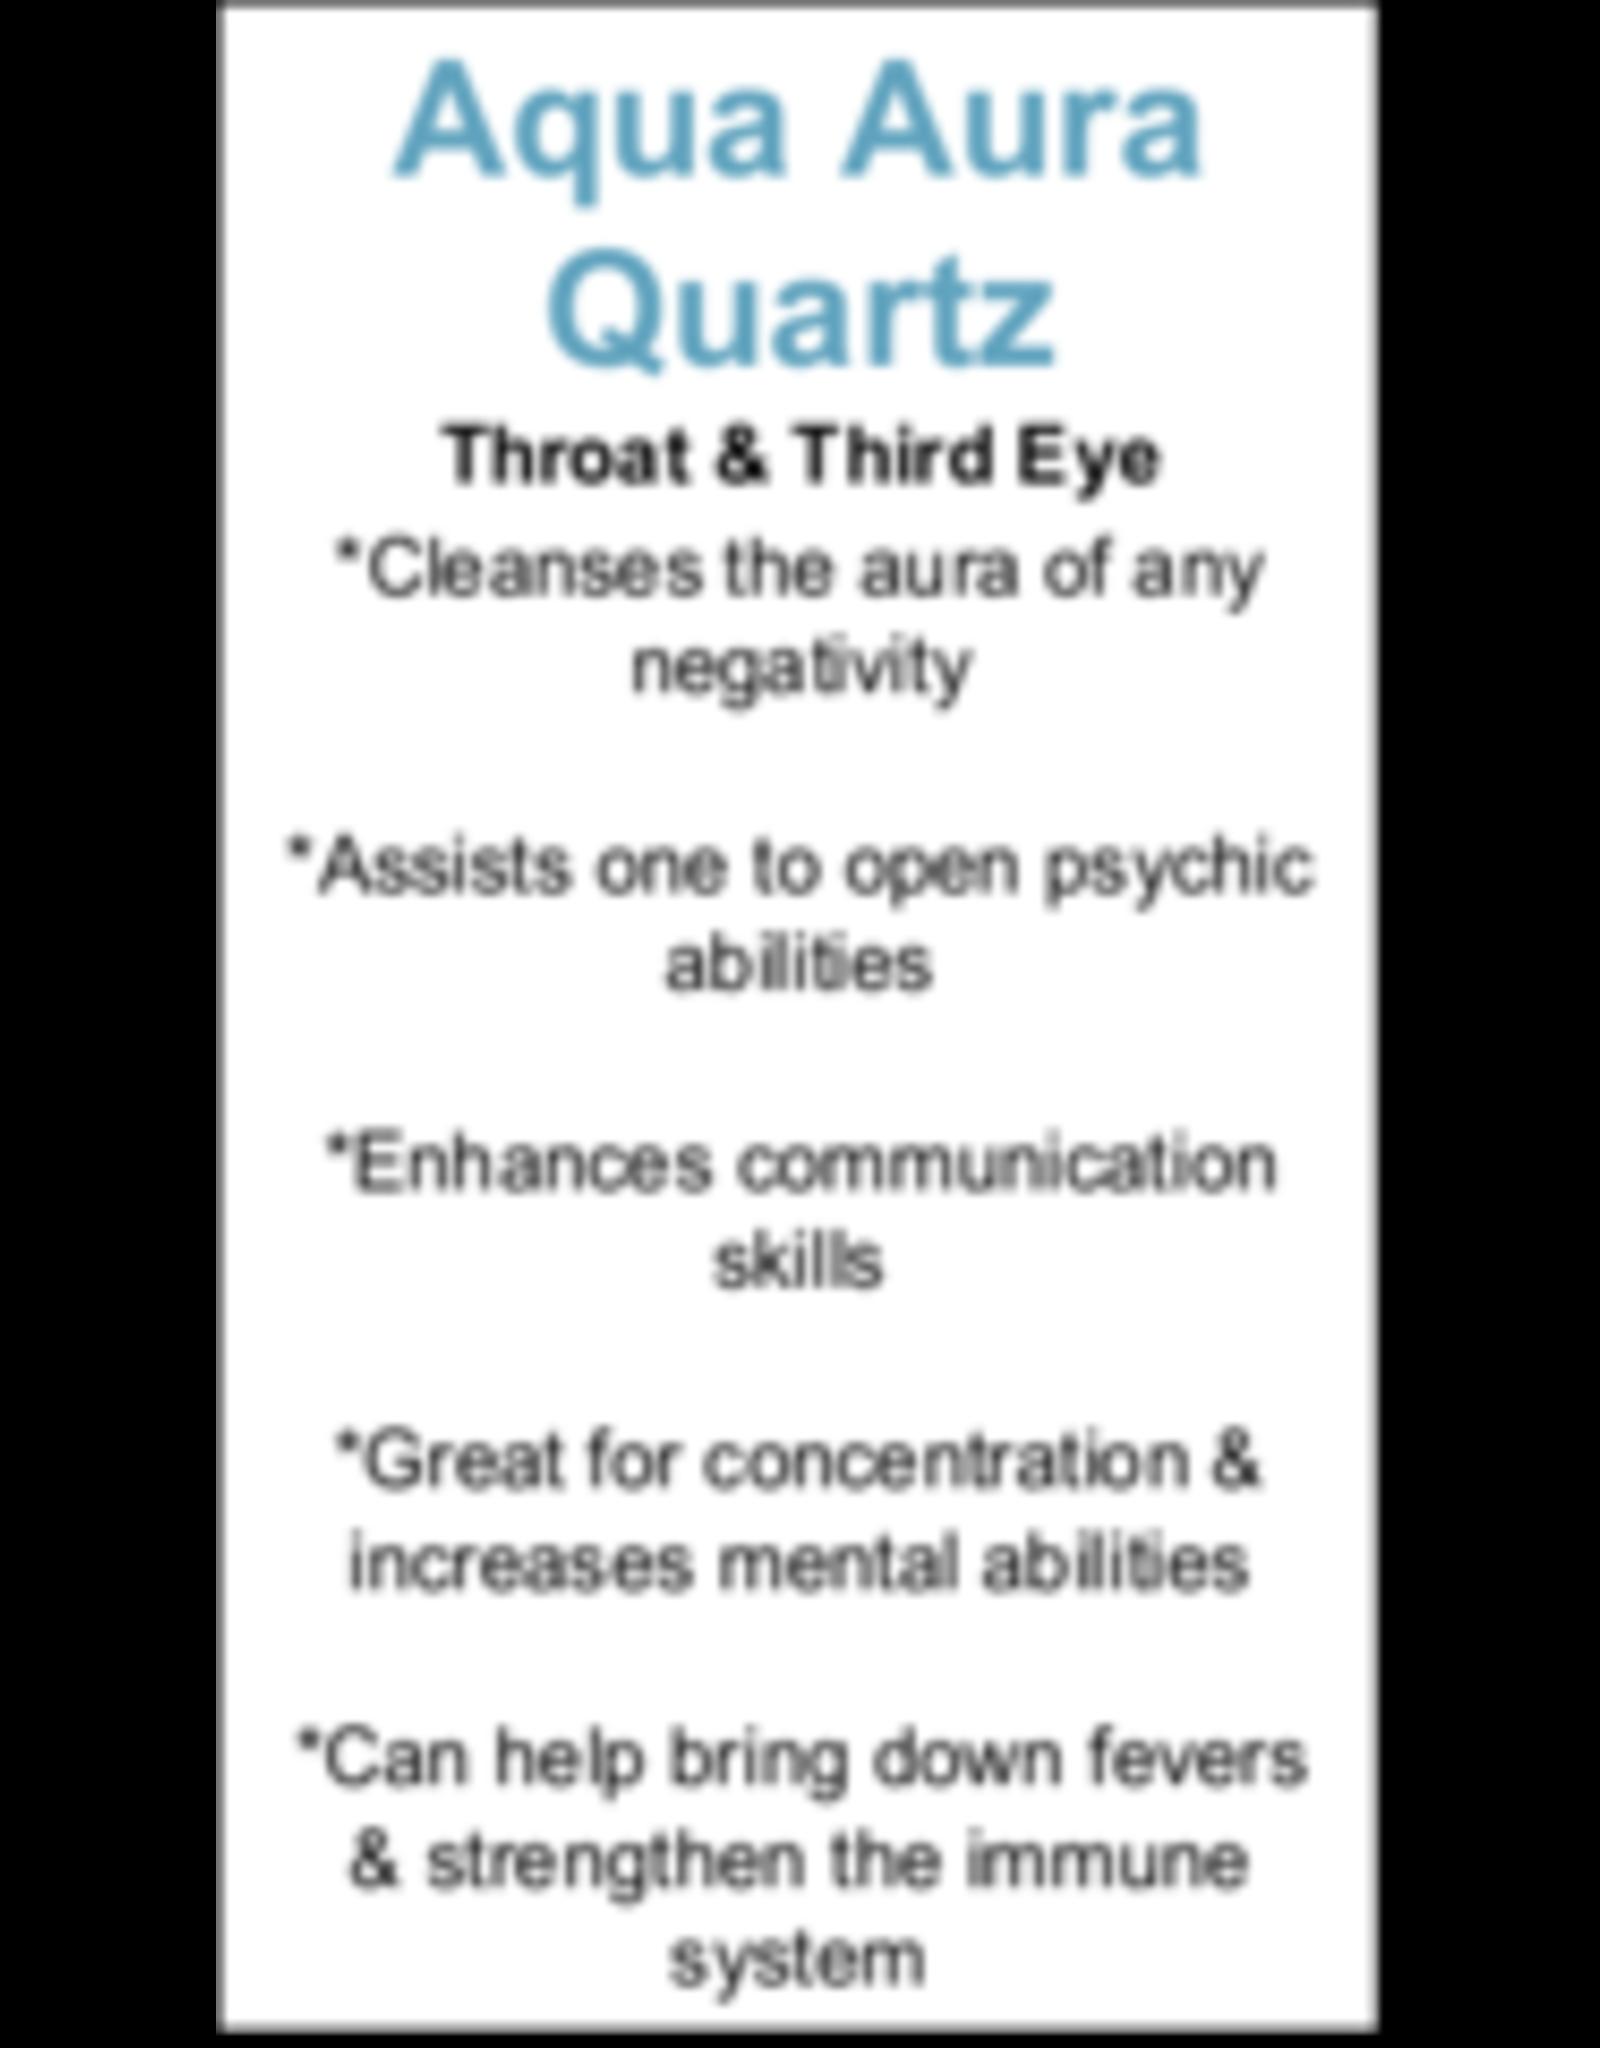 Blue Aura Quartz Heart